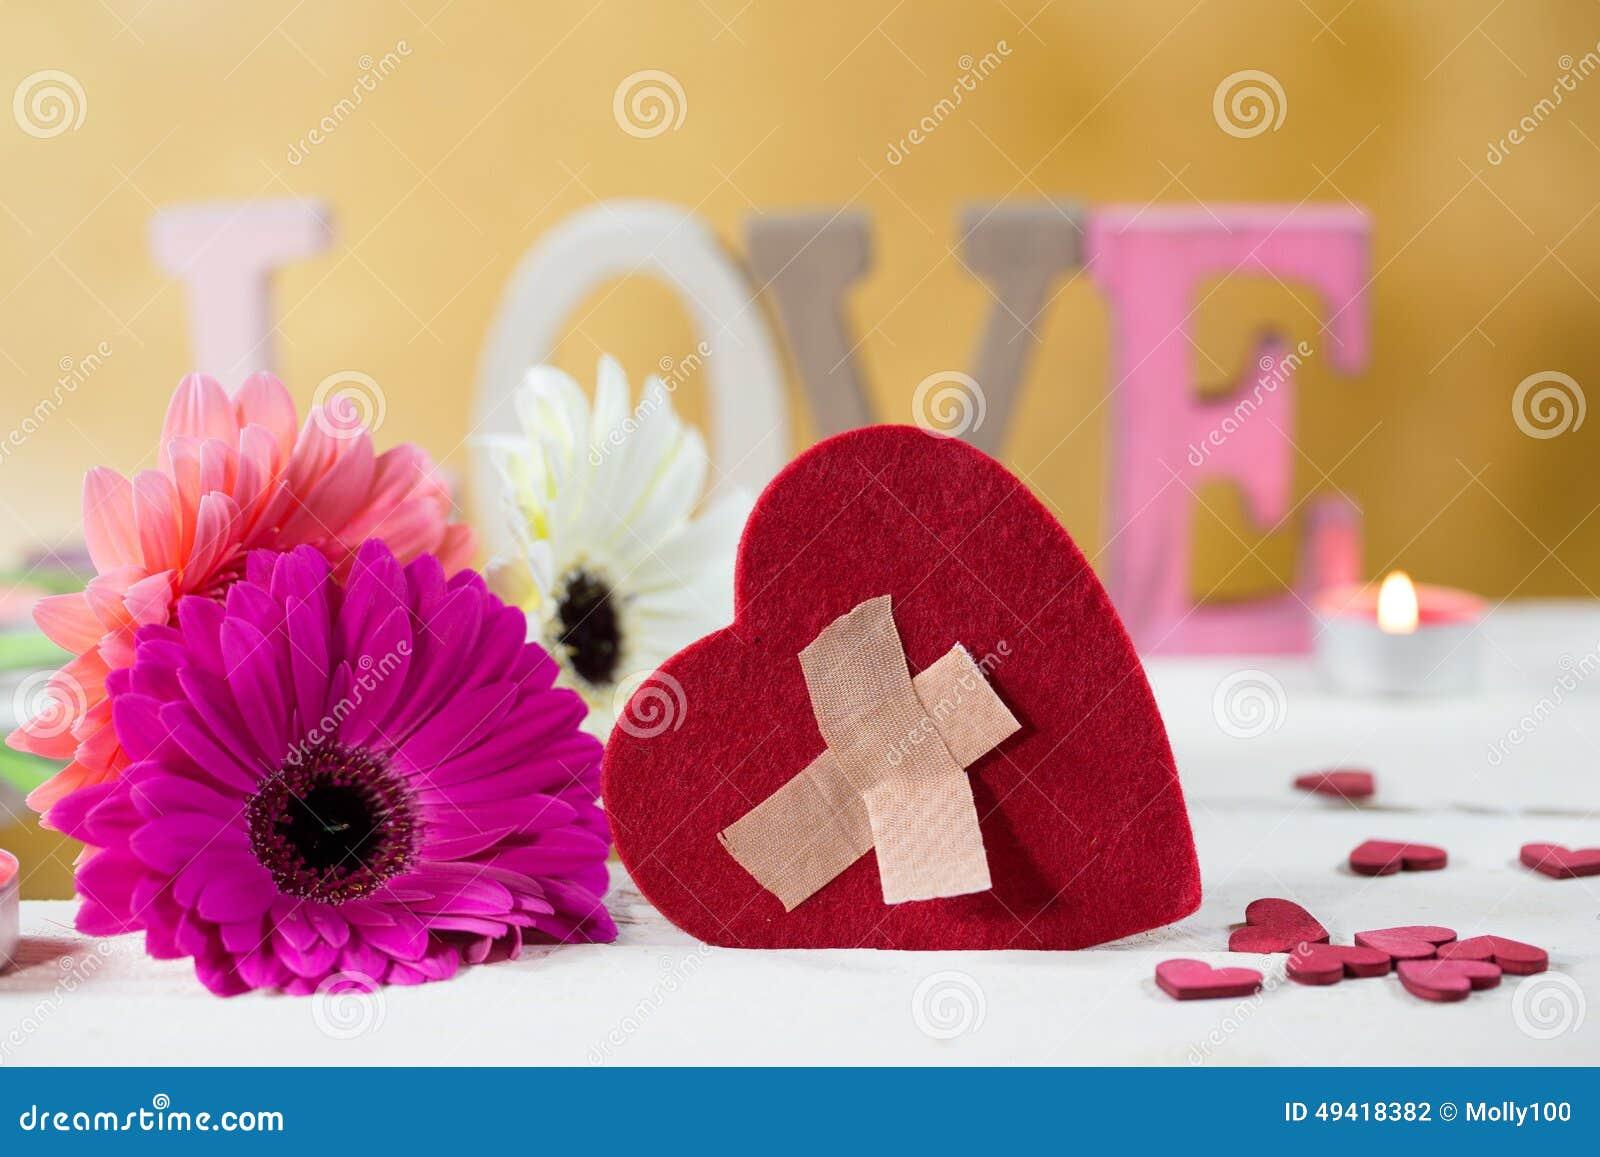 Pics of broken heart flower